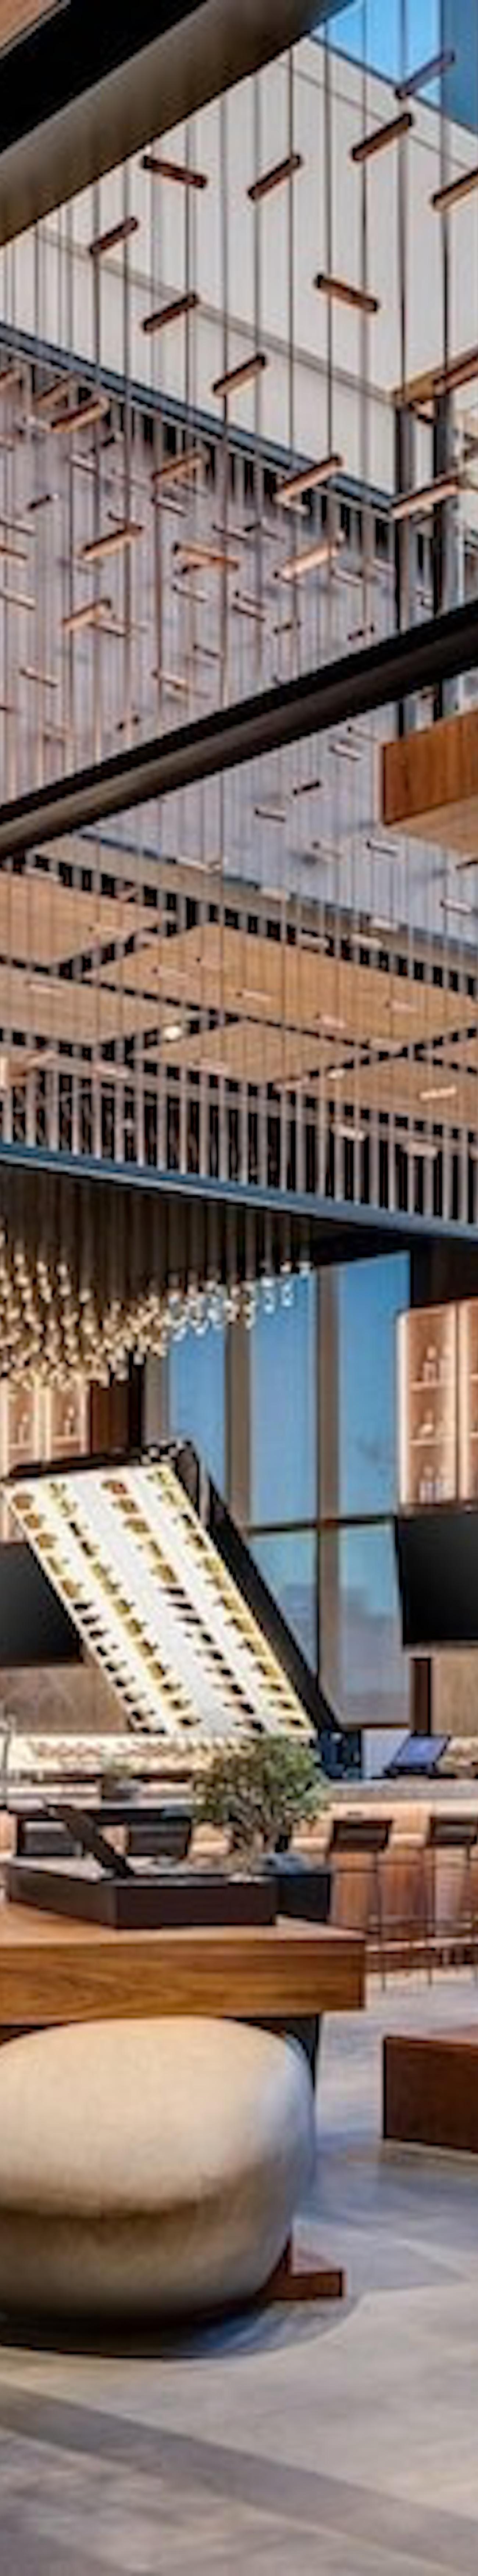 Odessa Marriott Hotel And Convention Center